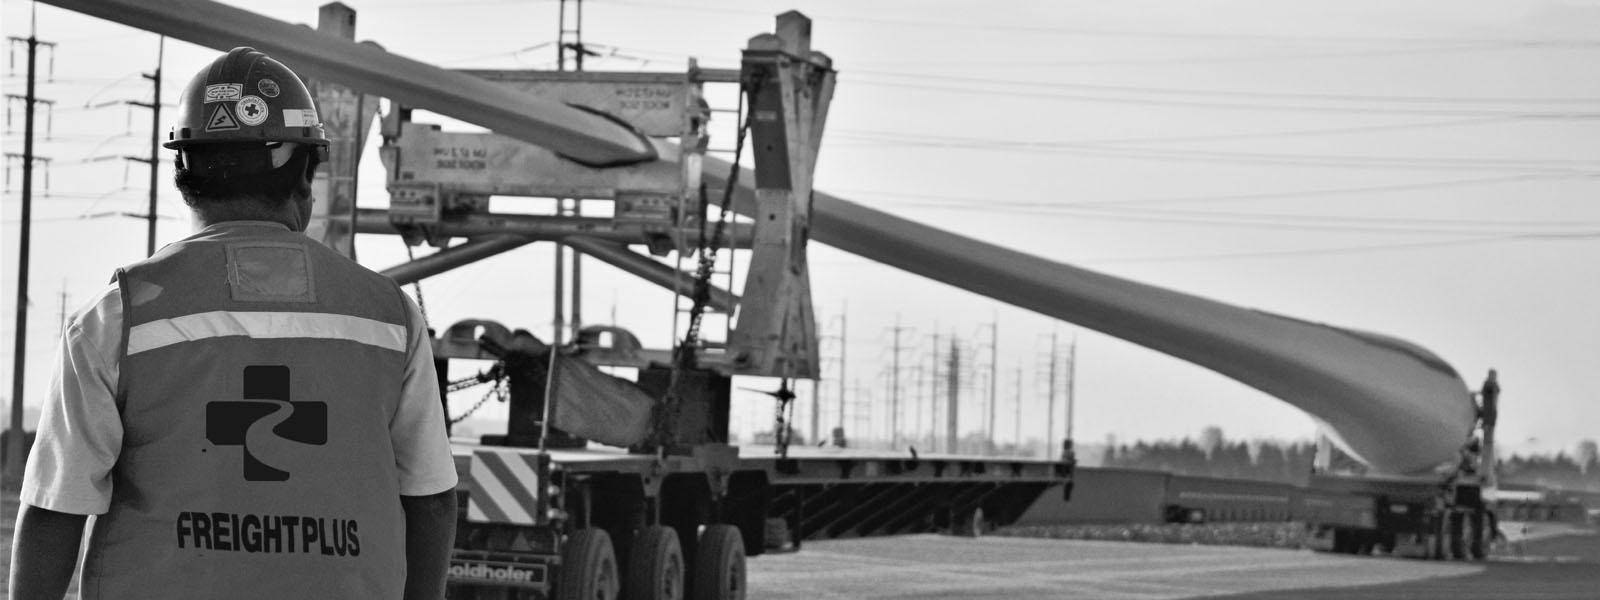 FPT Global wind turbine blade transport